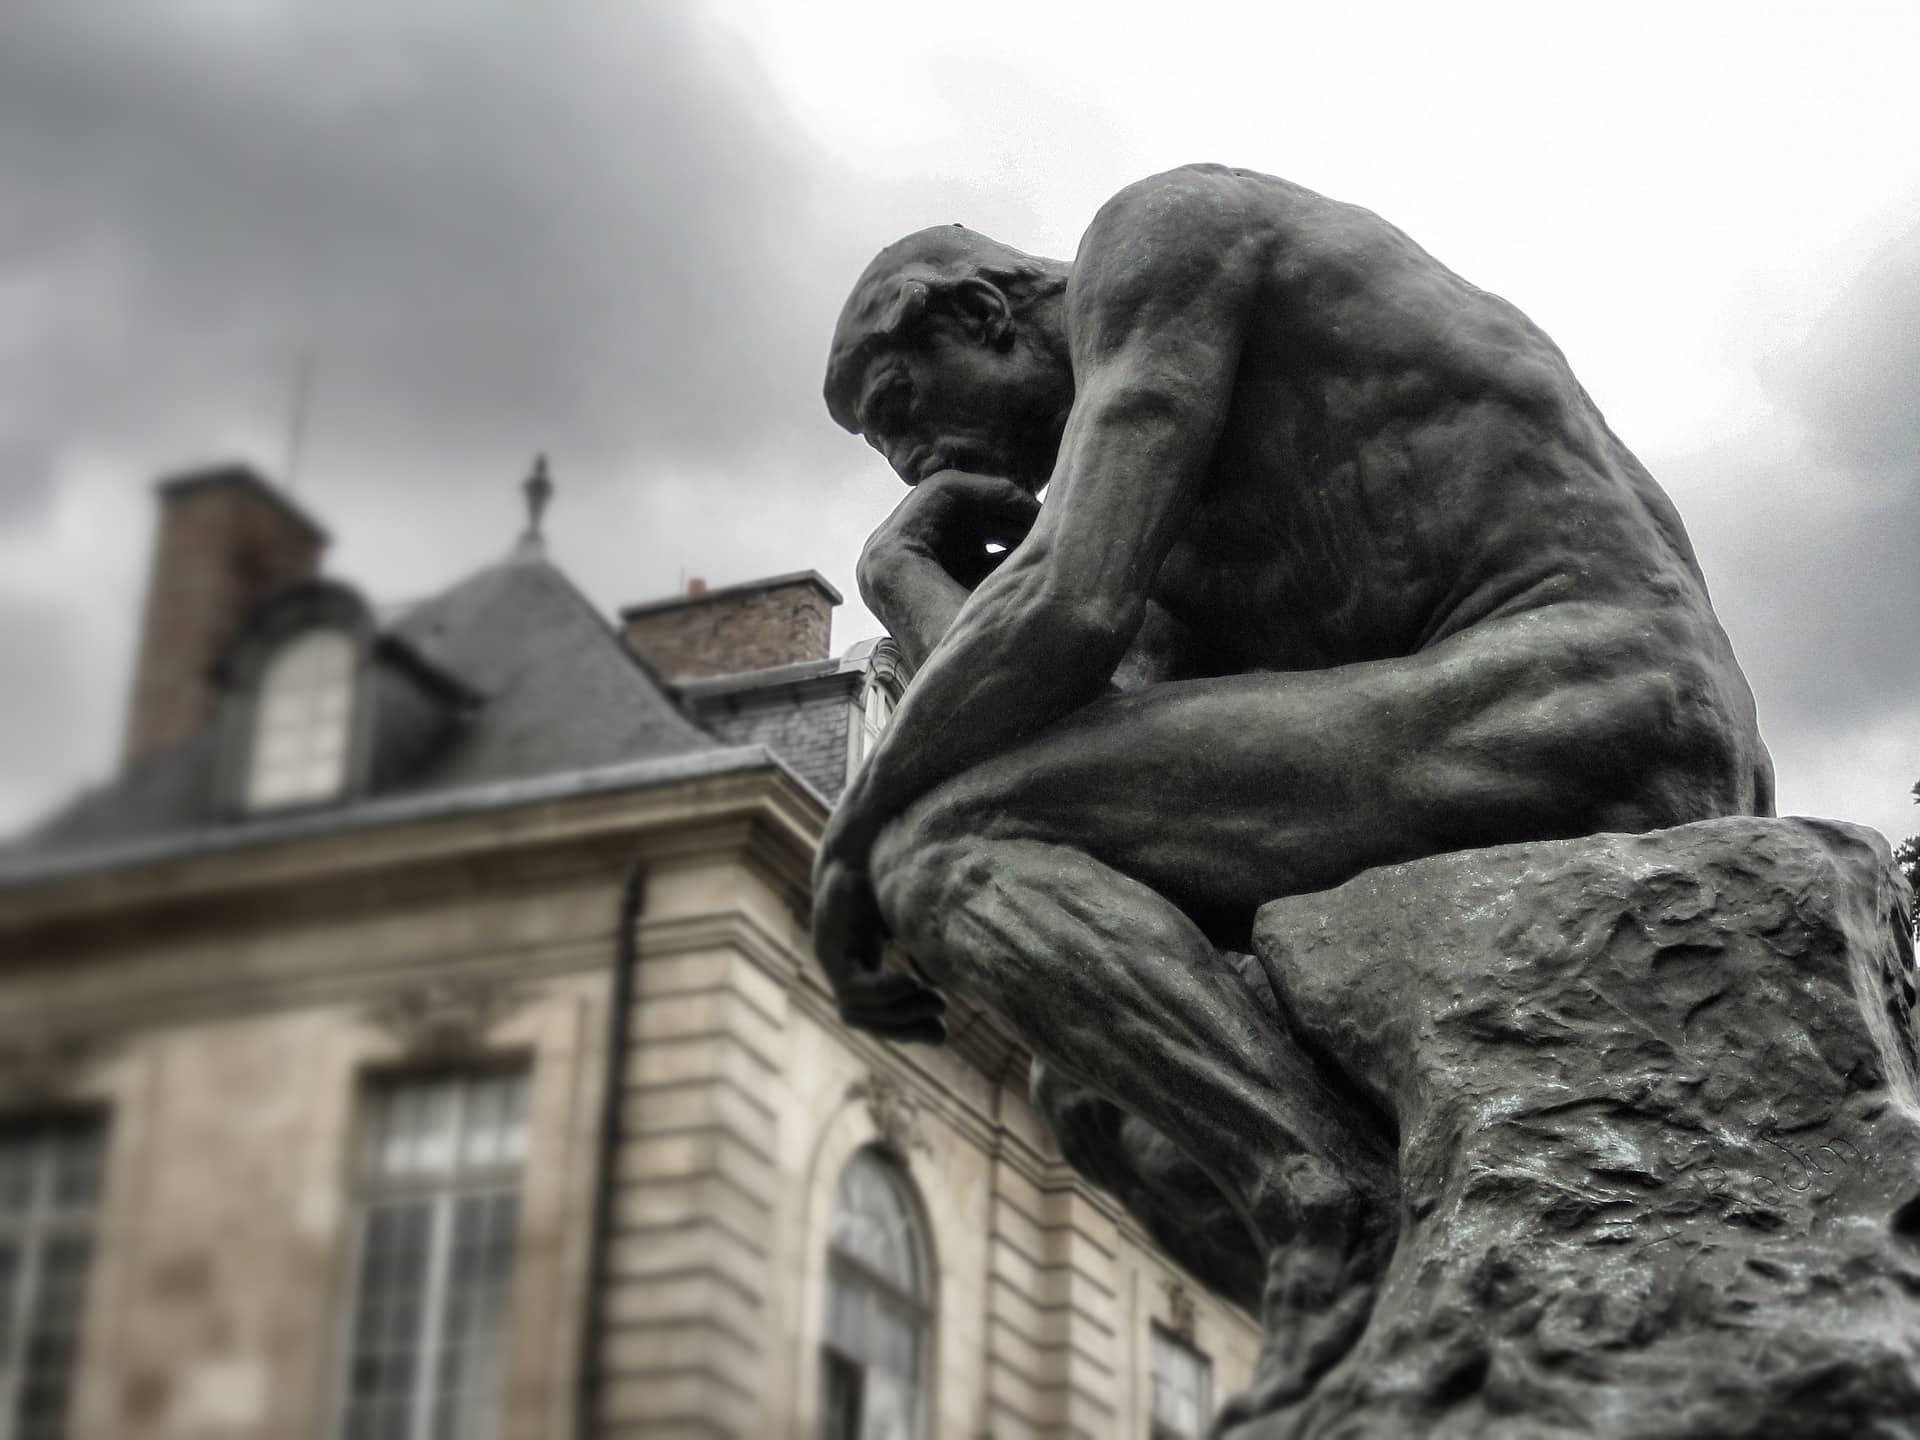 The Thinker- Rodin- Creativity- Nancy Hillis MD and Bruce Sawhill PhD